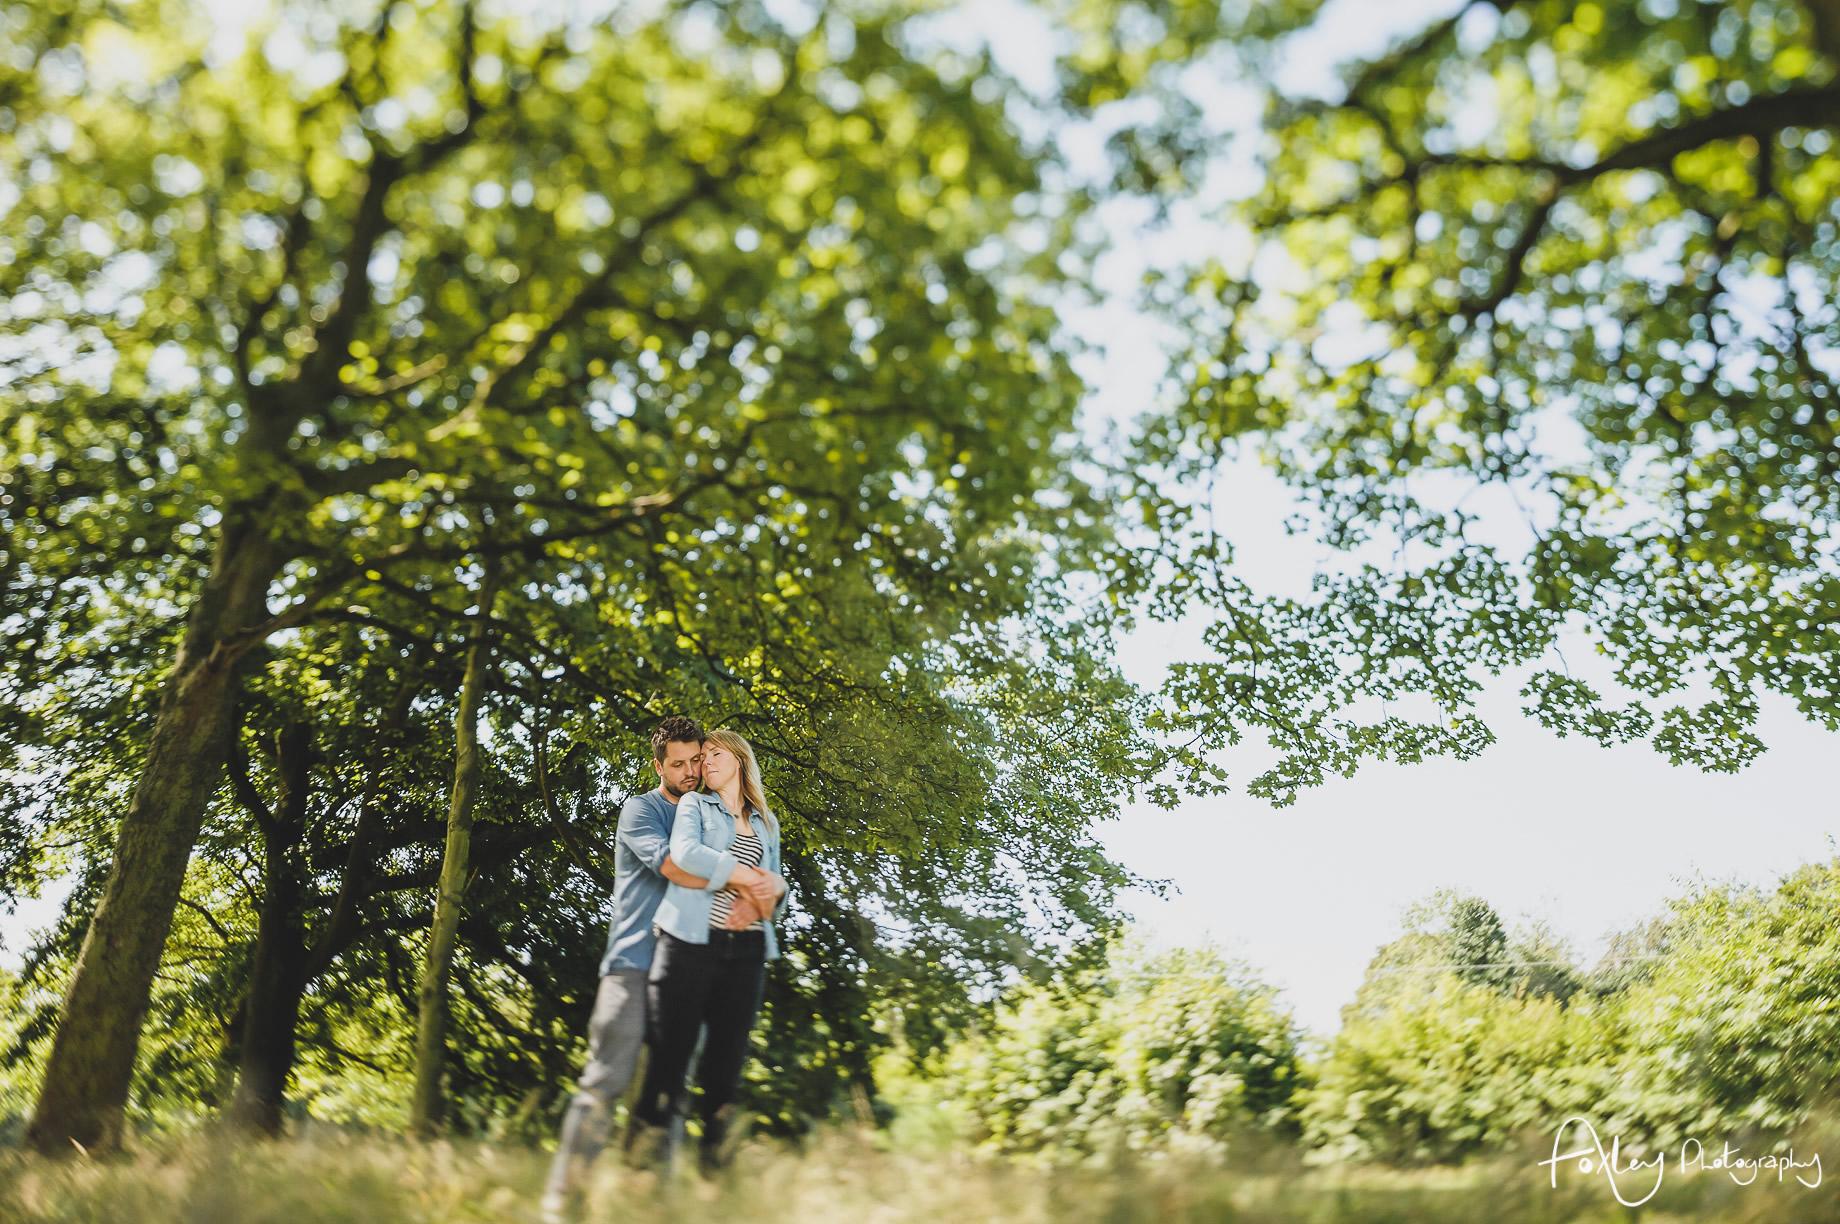 Lyndsey and Jon Pre-Wedding Shoot at Sefton Park 020